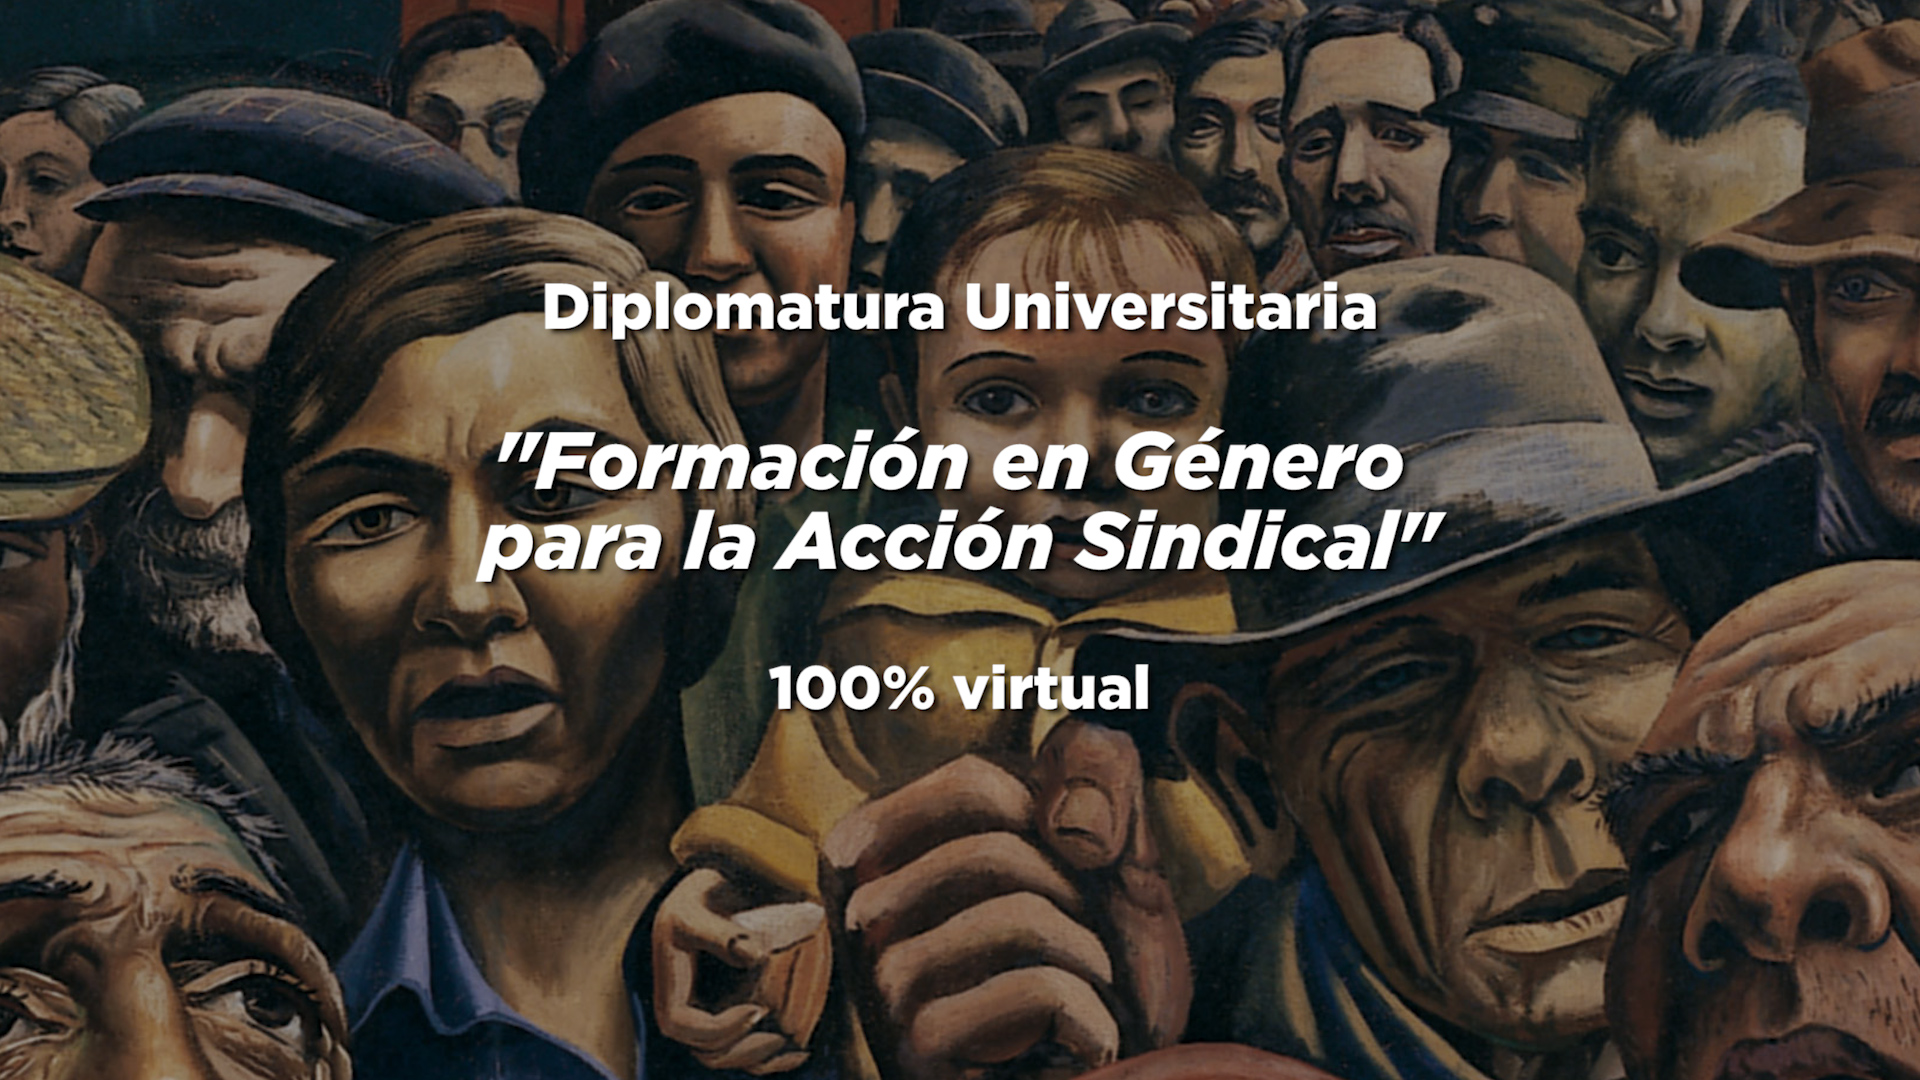 Spot Diplomatura Universitaria